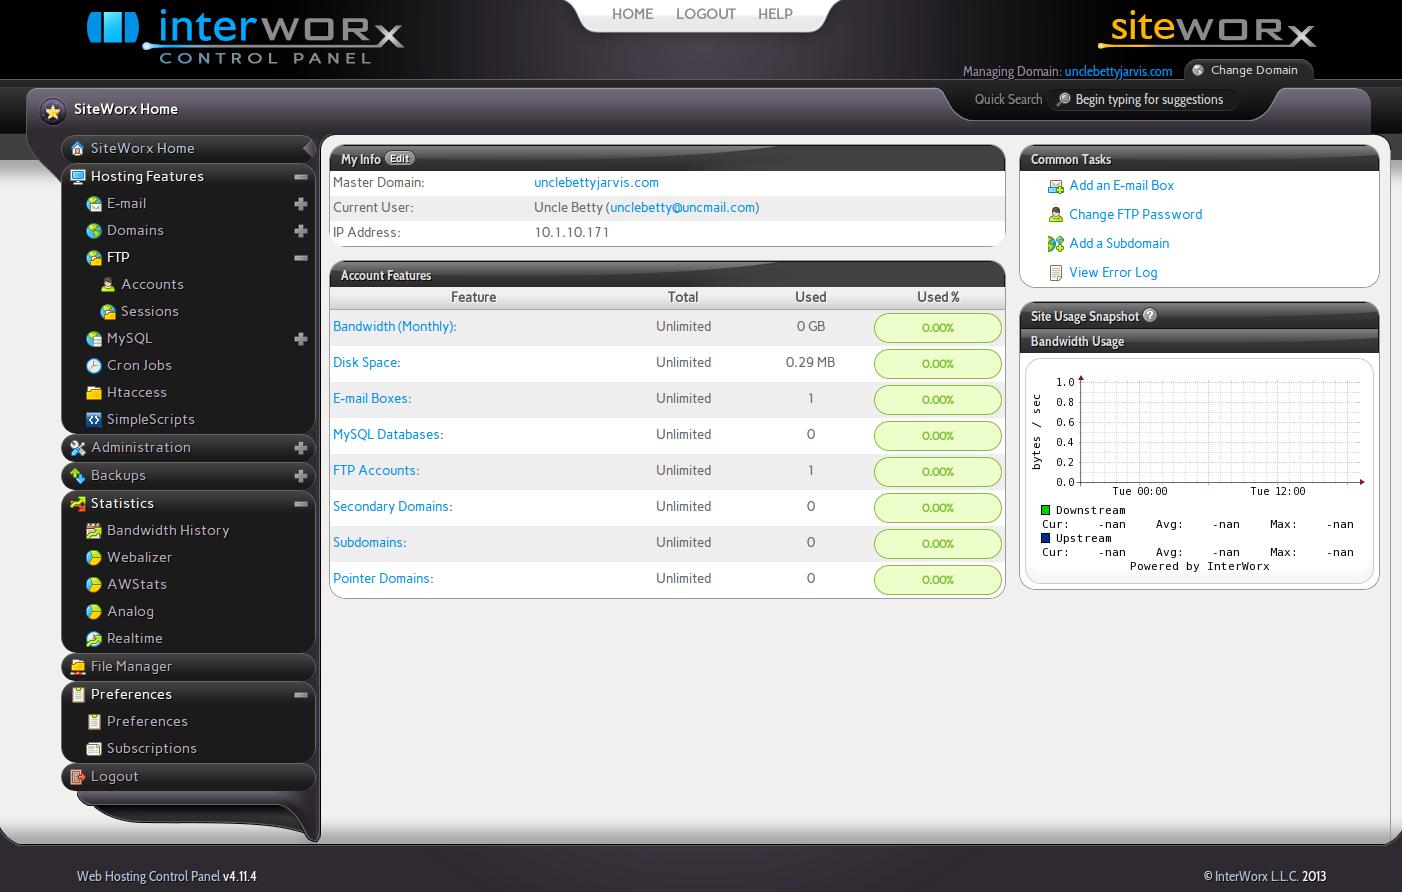 Screenshot of Interworx control panel